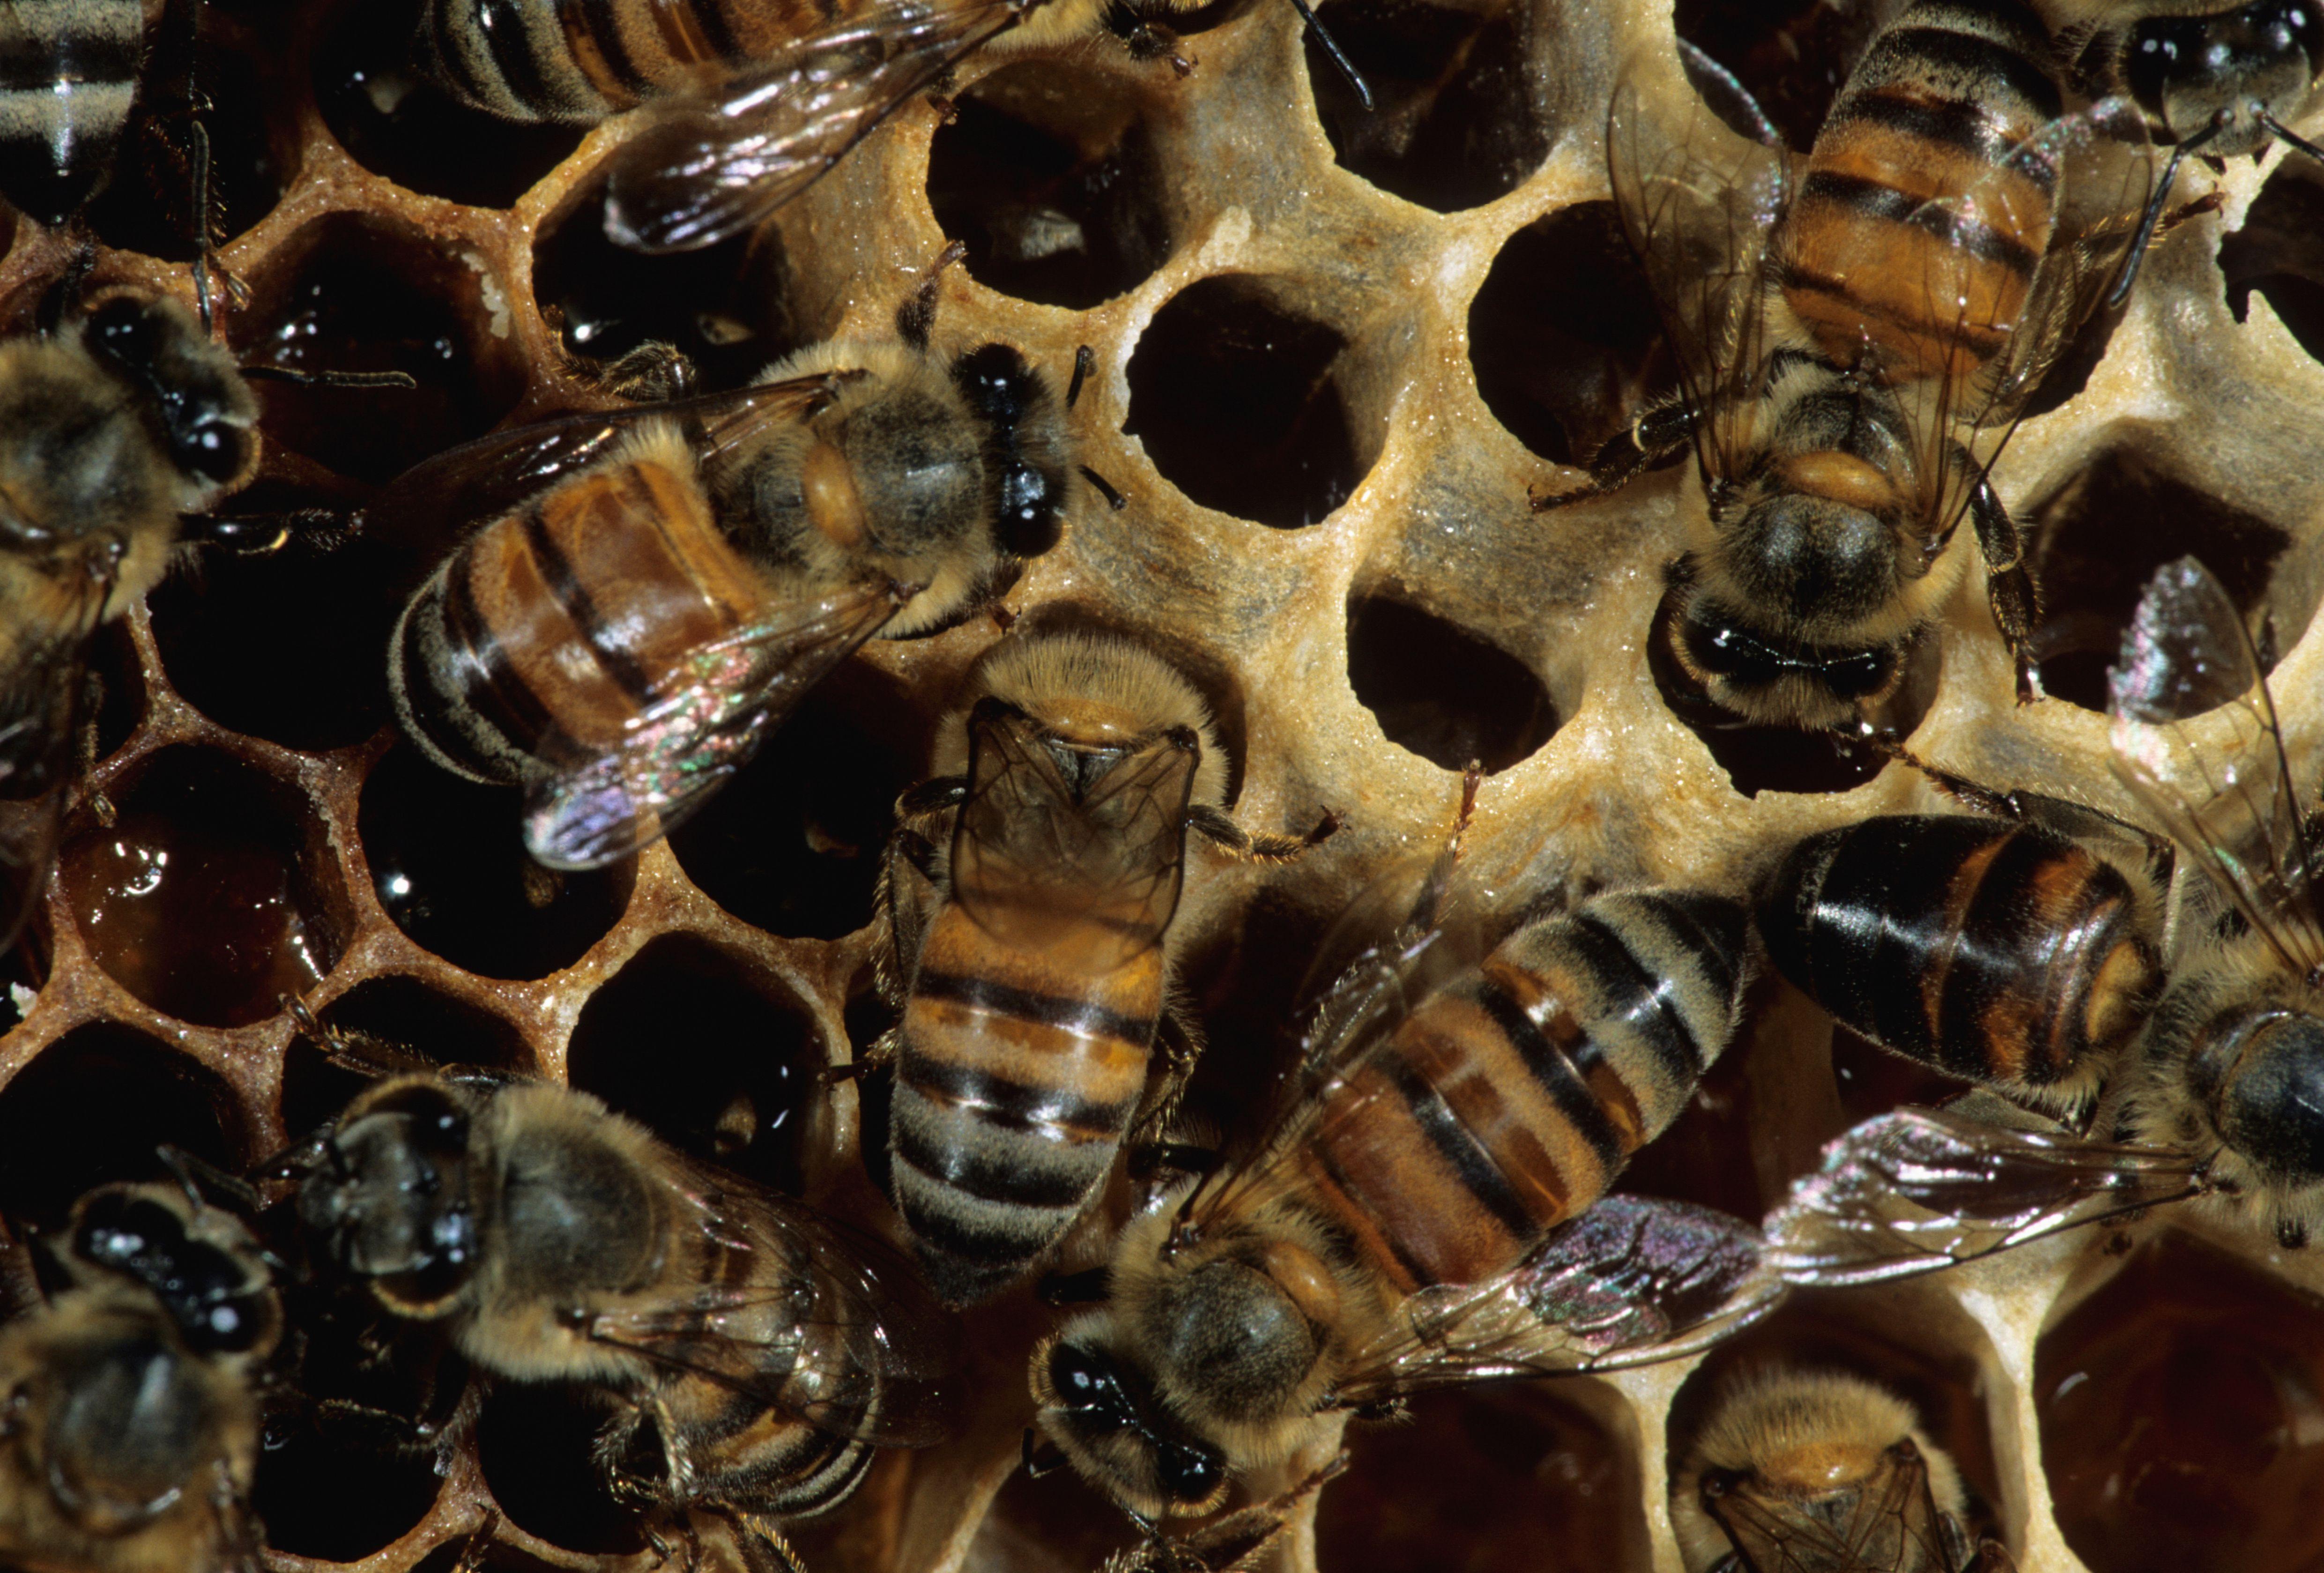 Killer Bees Swarms And Attacks In Arizona